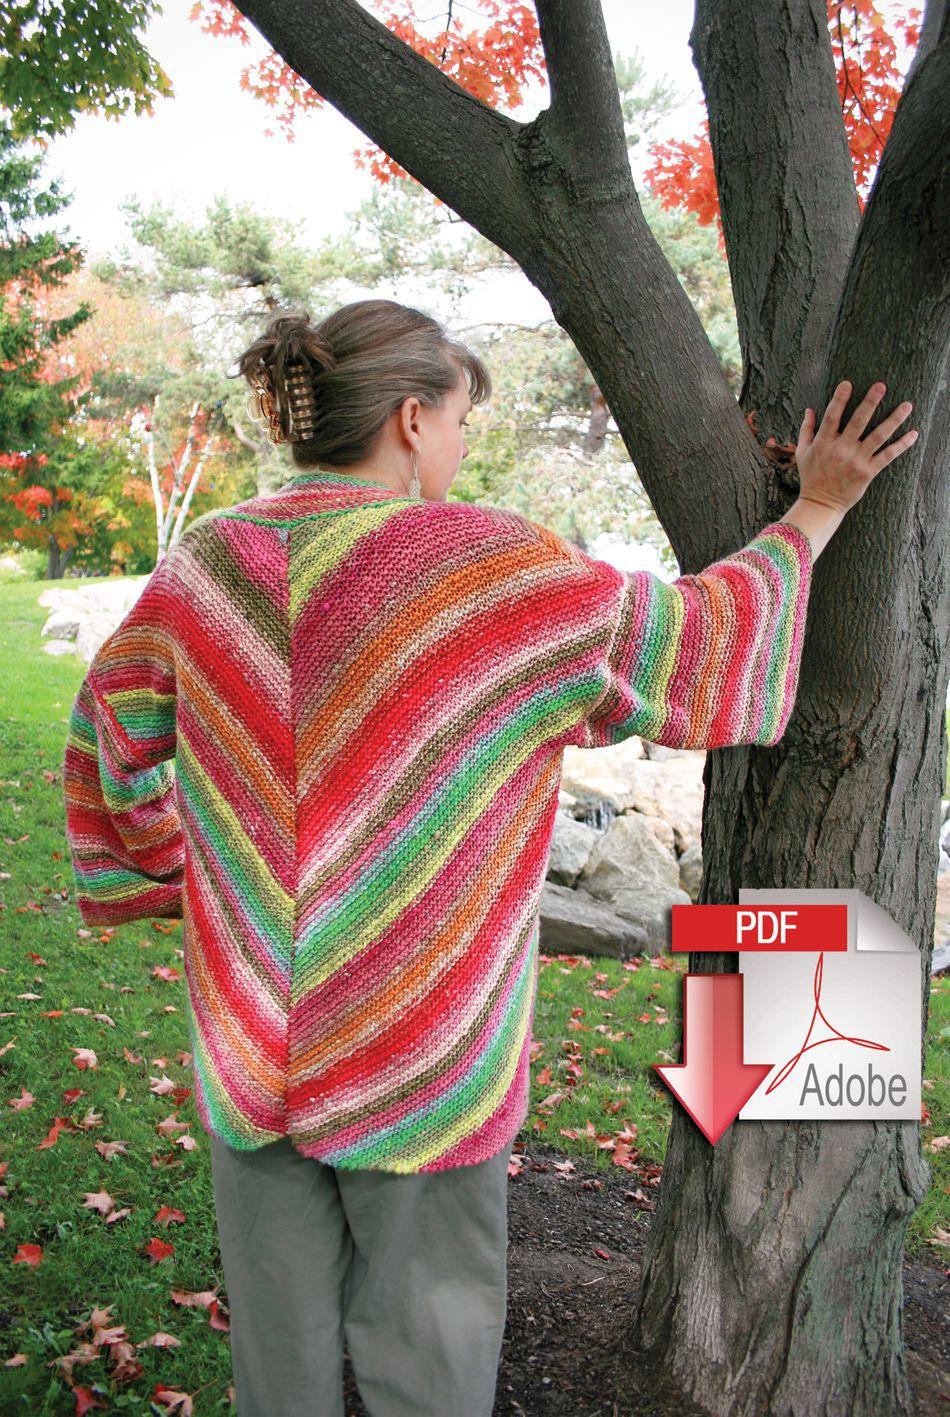 Knitting Kimono Pattern Free : Diagonal Kimono - Noro Taiyo - Pattern download, Knitting Pattern - Halcyon Yarn